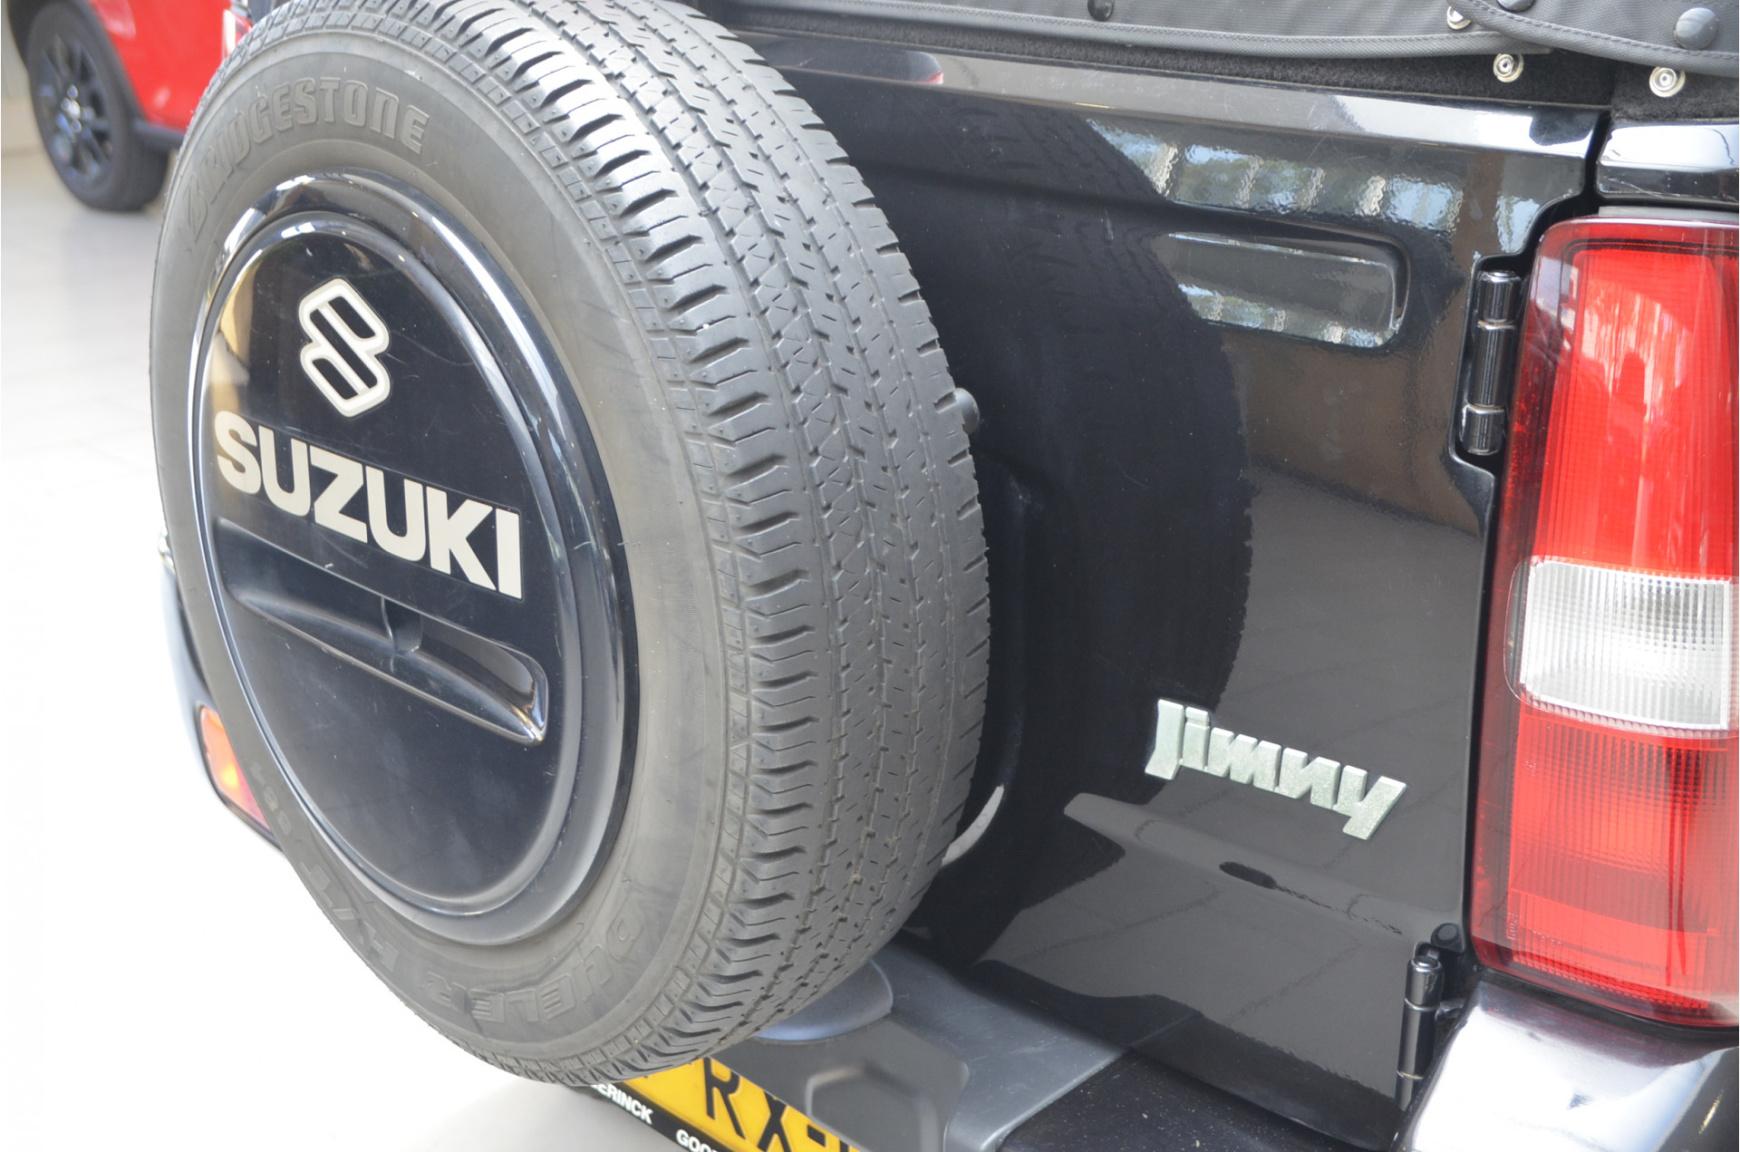 Suzuki-Jimny-21